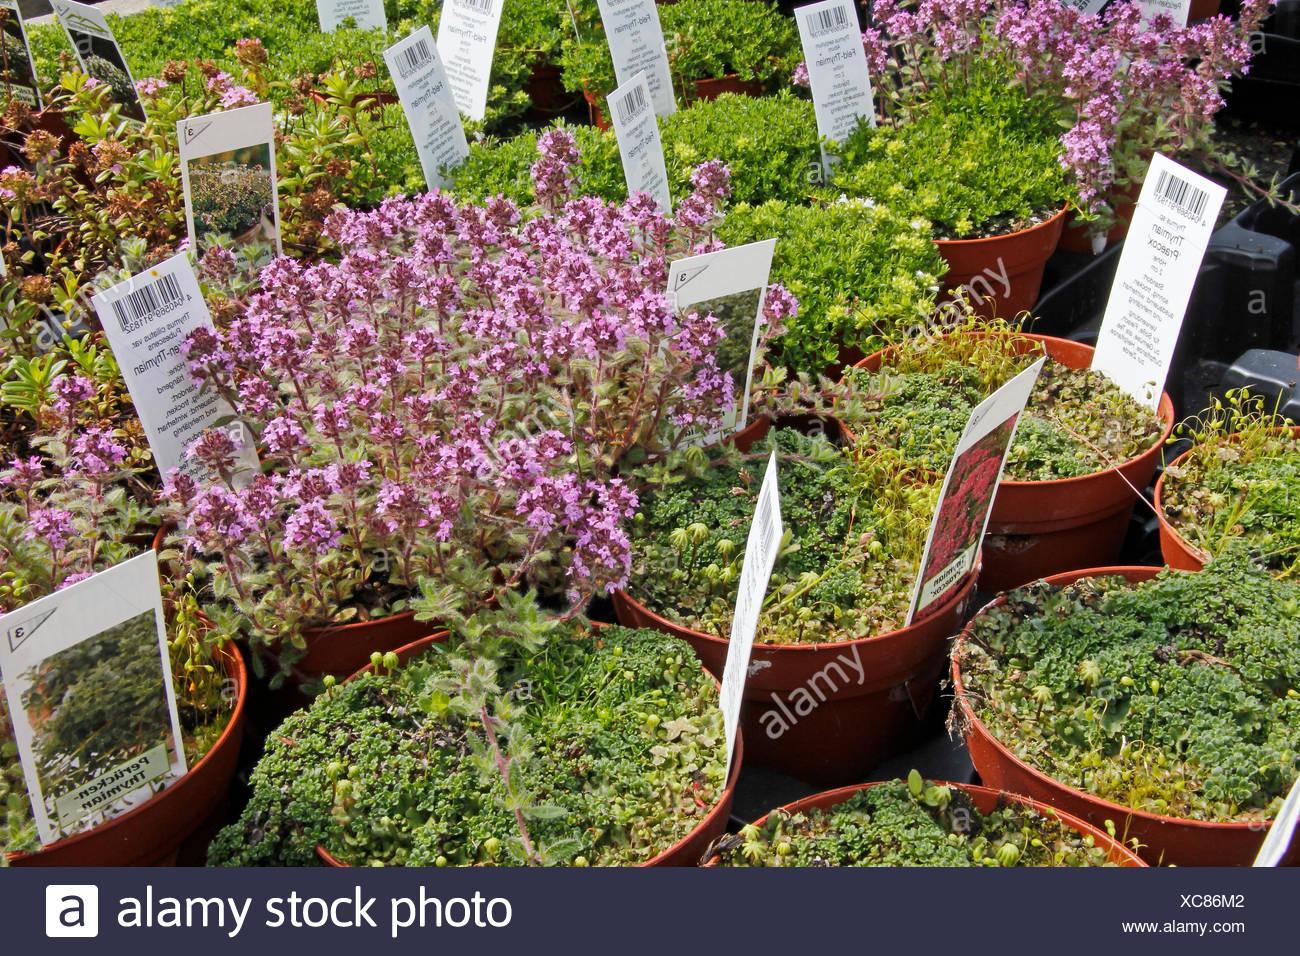 Thymian Kruter Grtnerei Gewchshaus Garten Duft Aroma Gartenbau Stock